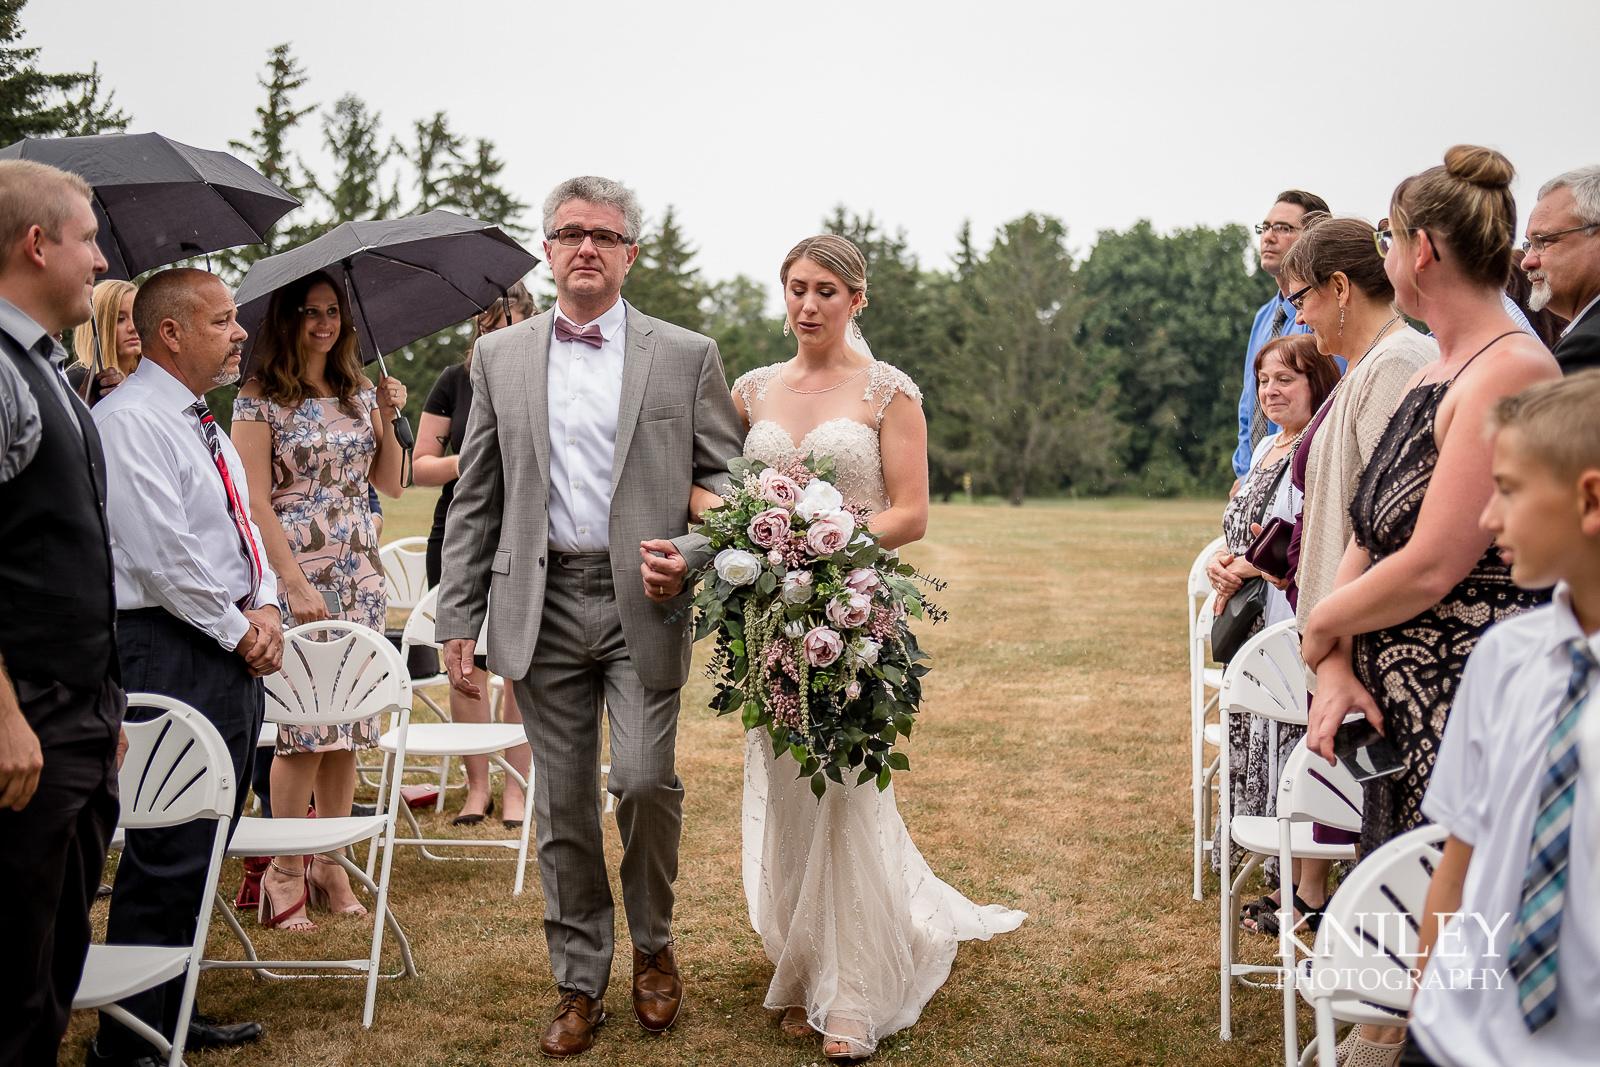 042 - Ontario Golf Club Wedding Pictures - XT2B8212.jpg